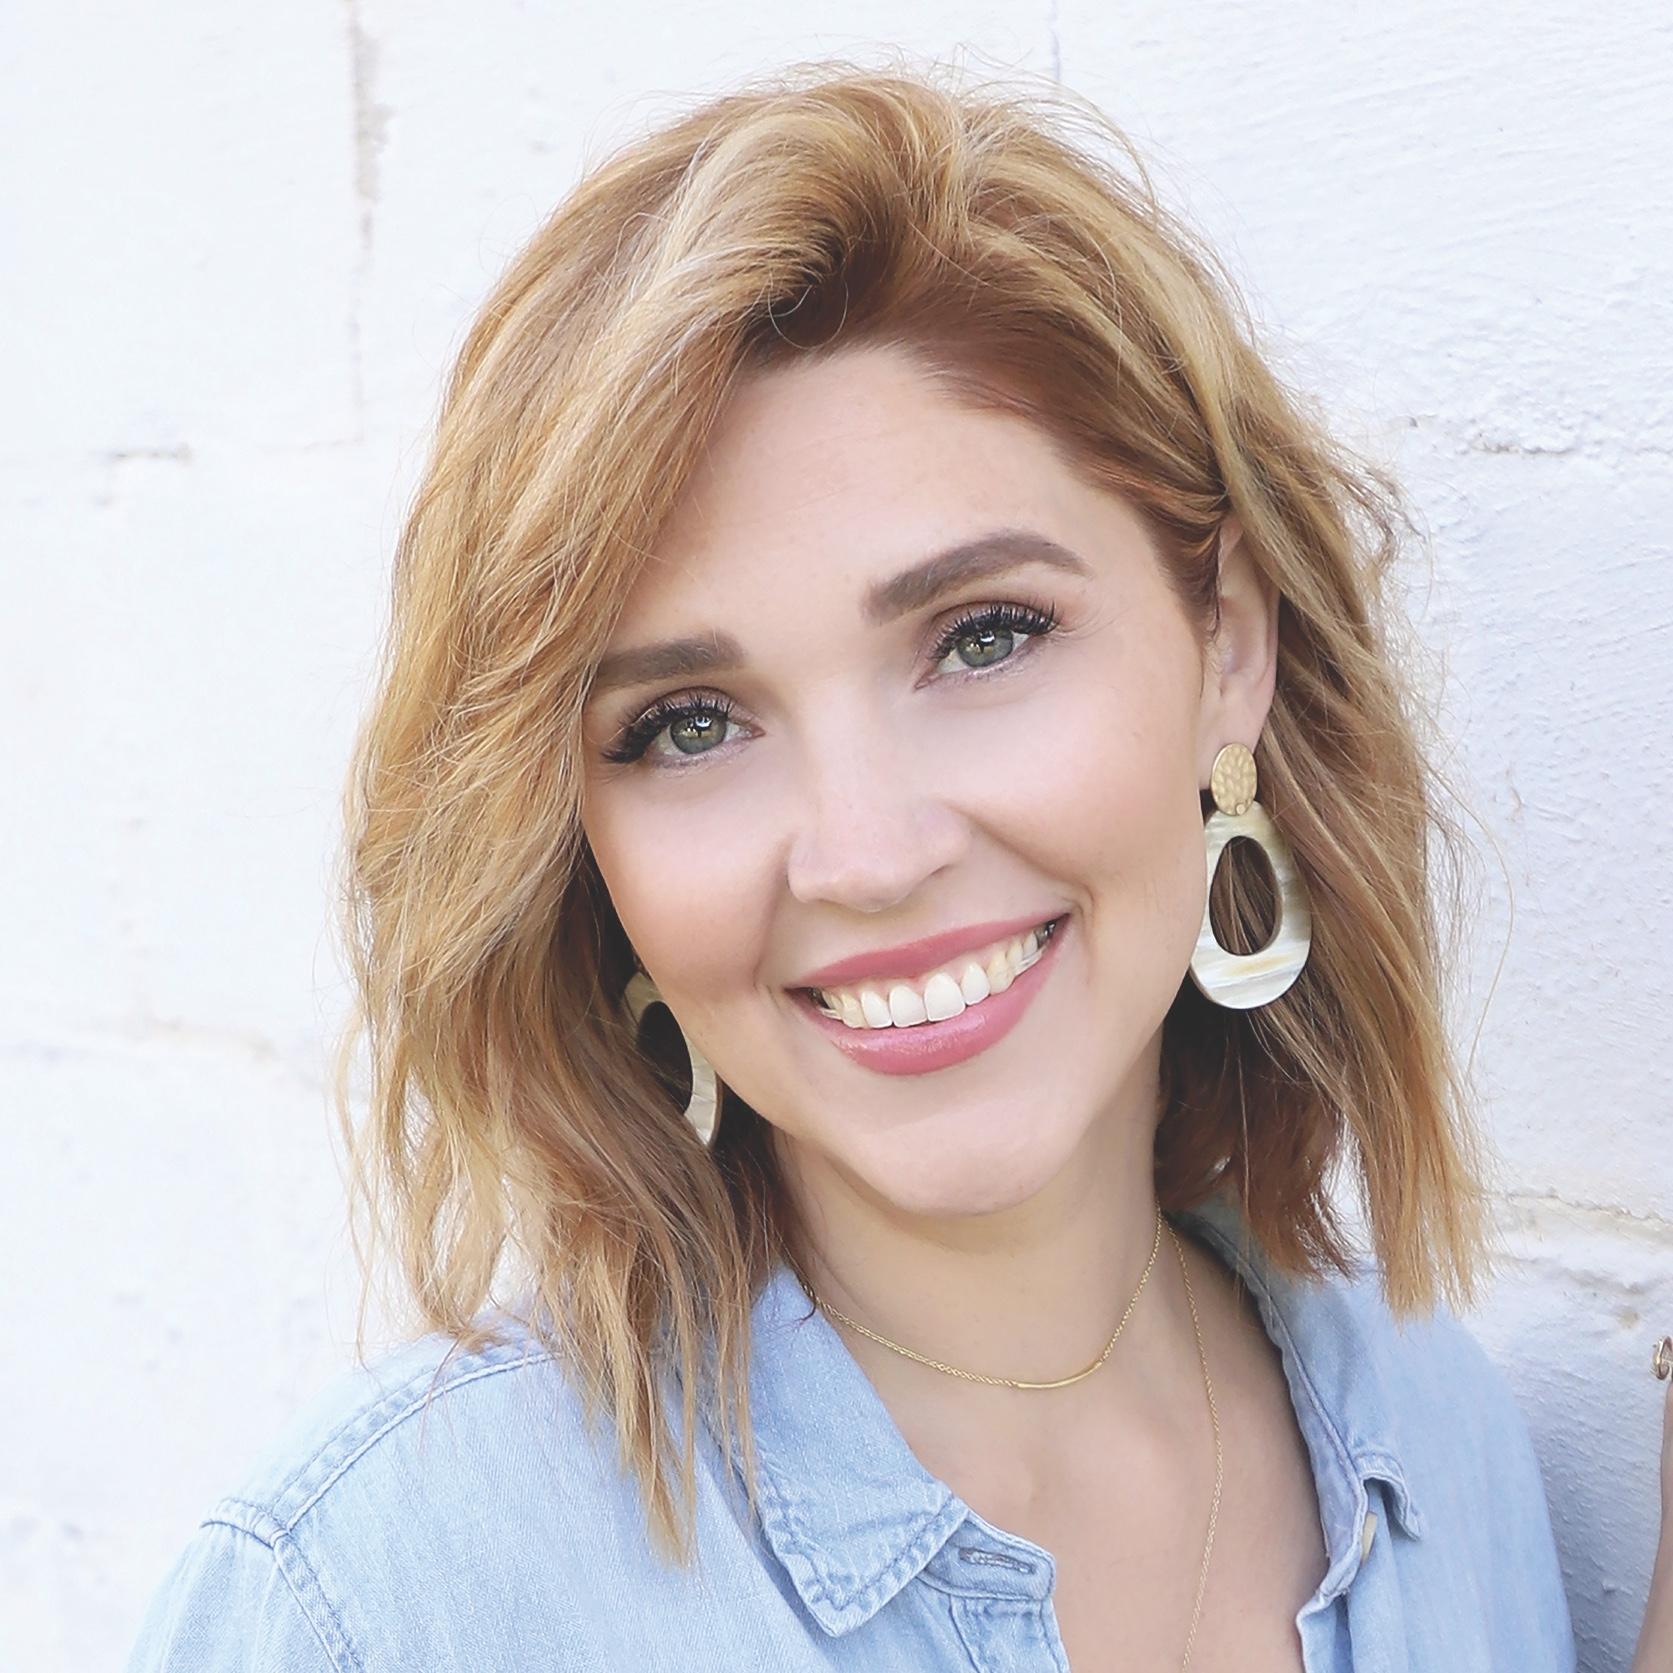 Angela Braniff